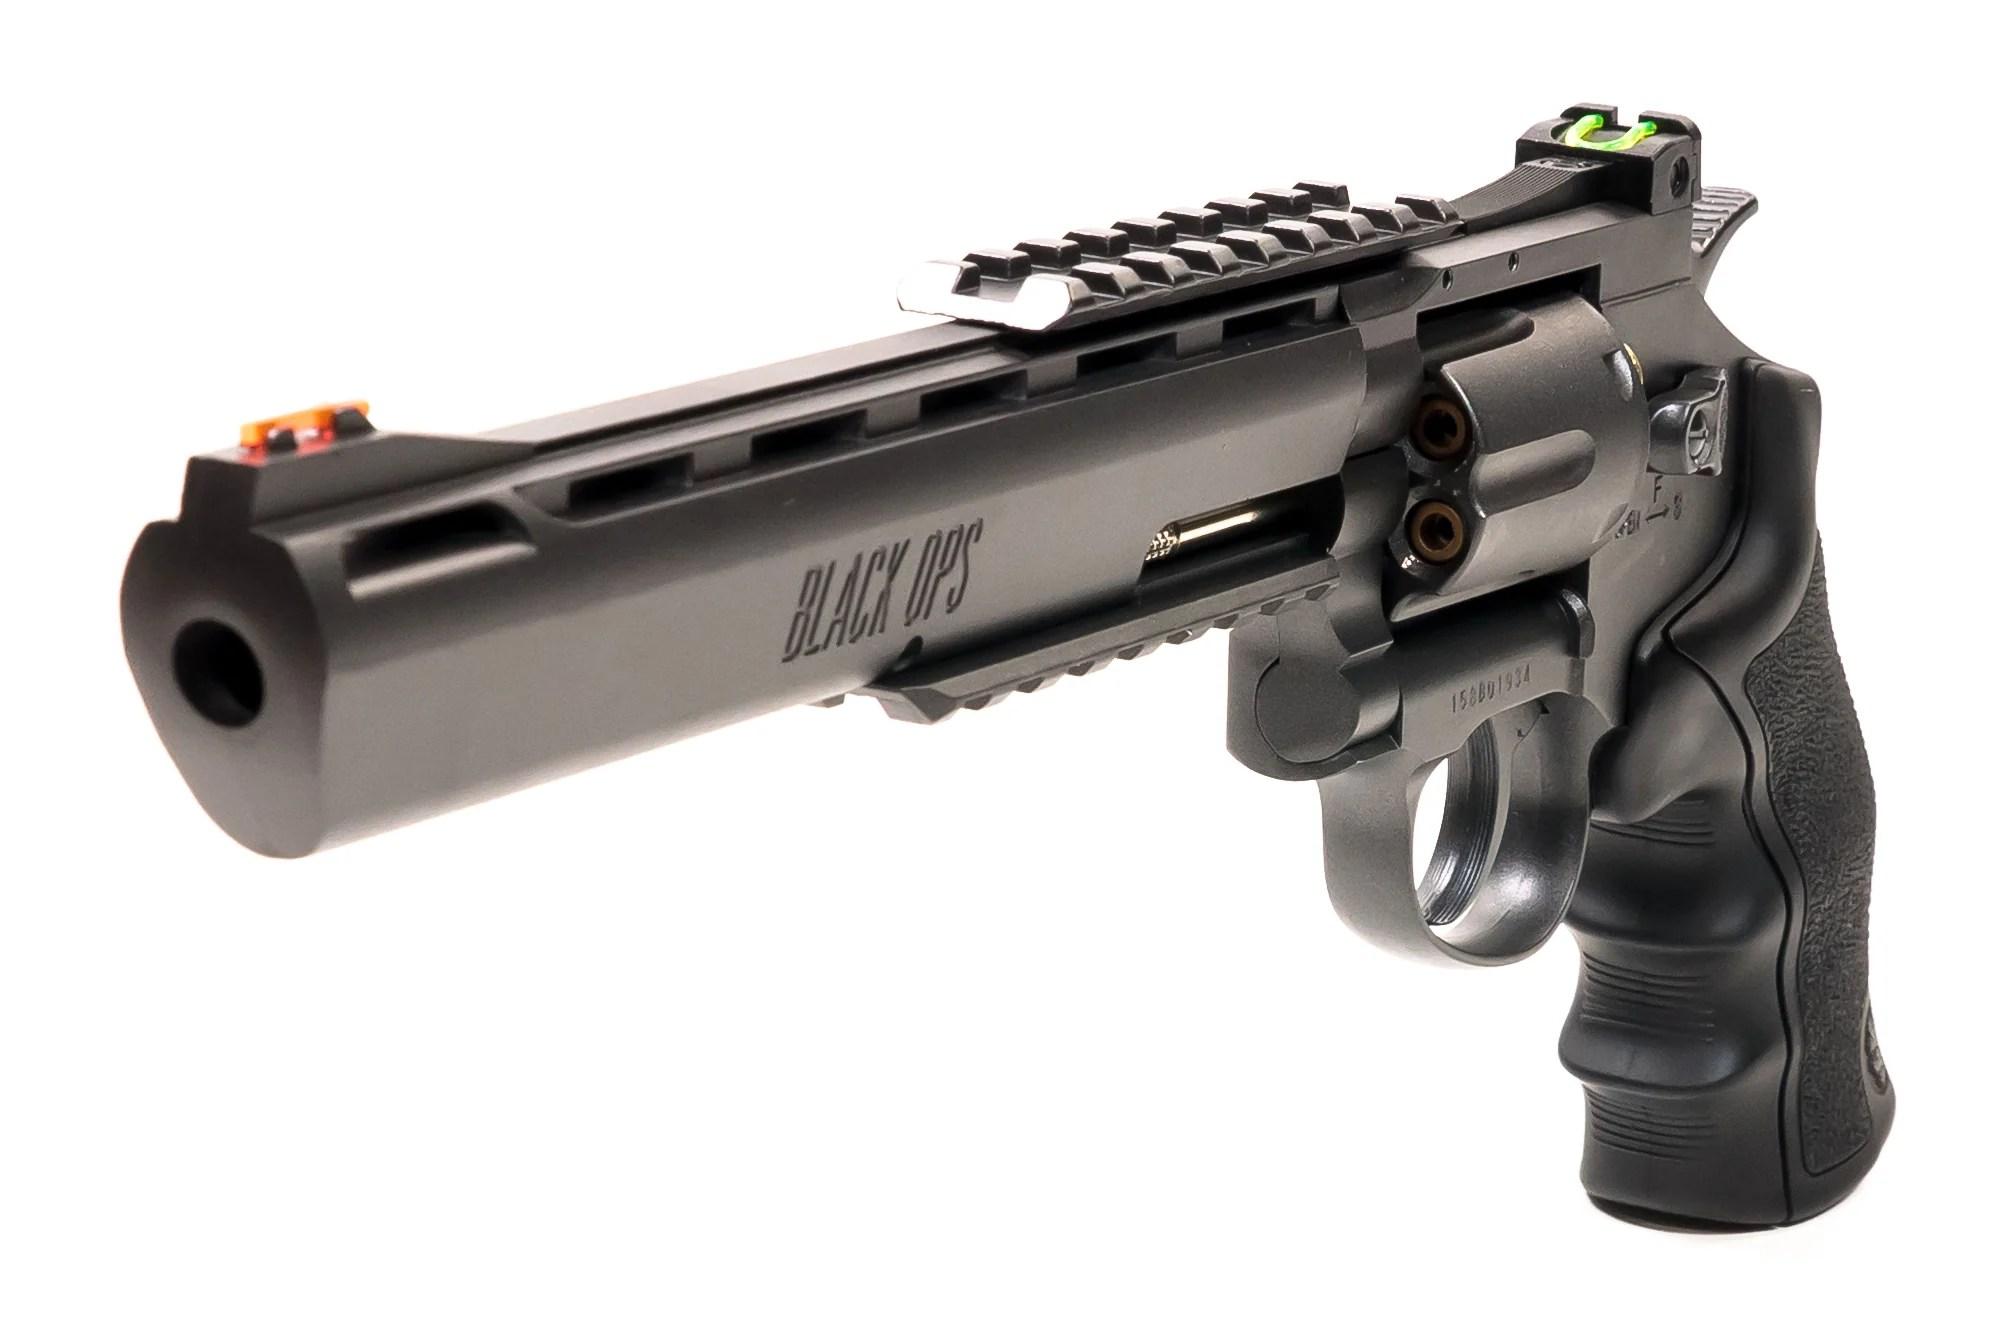 hight resolution of black ops exterminator 8 inch revolver gun metal finish full metal co2 bb pistol shoot 177 bbs pellet cartridges available